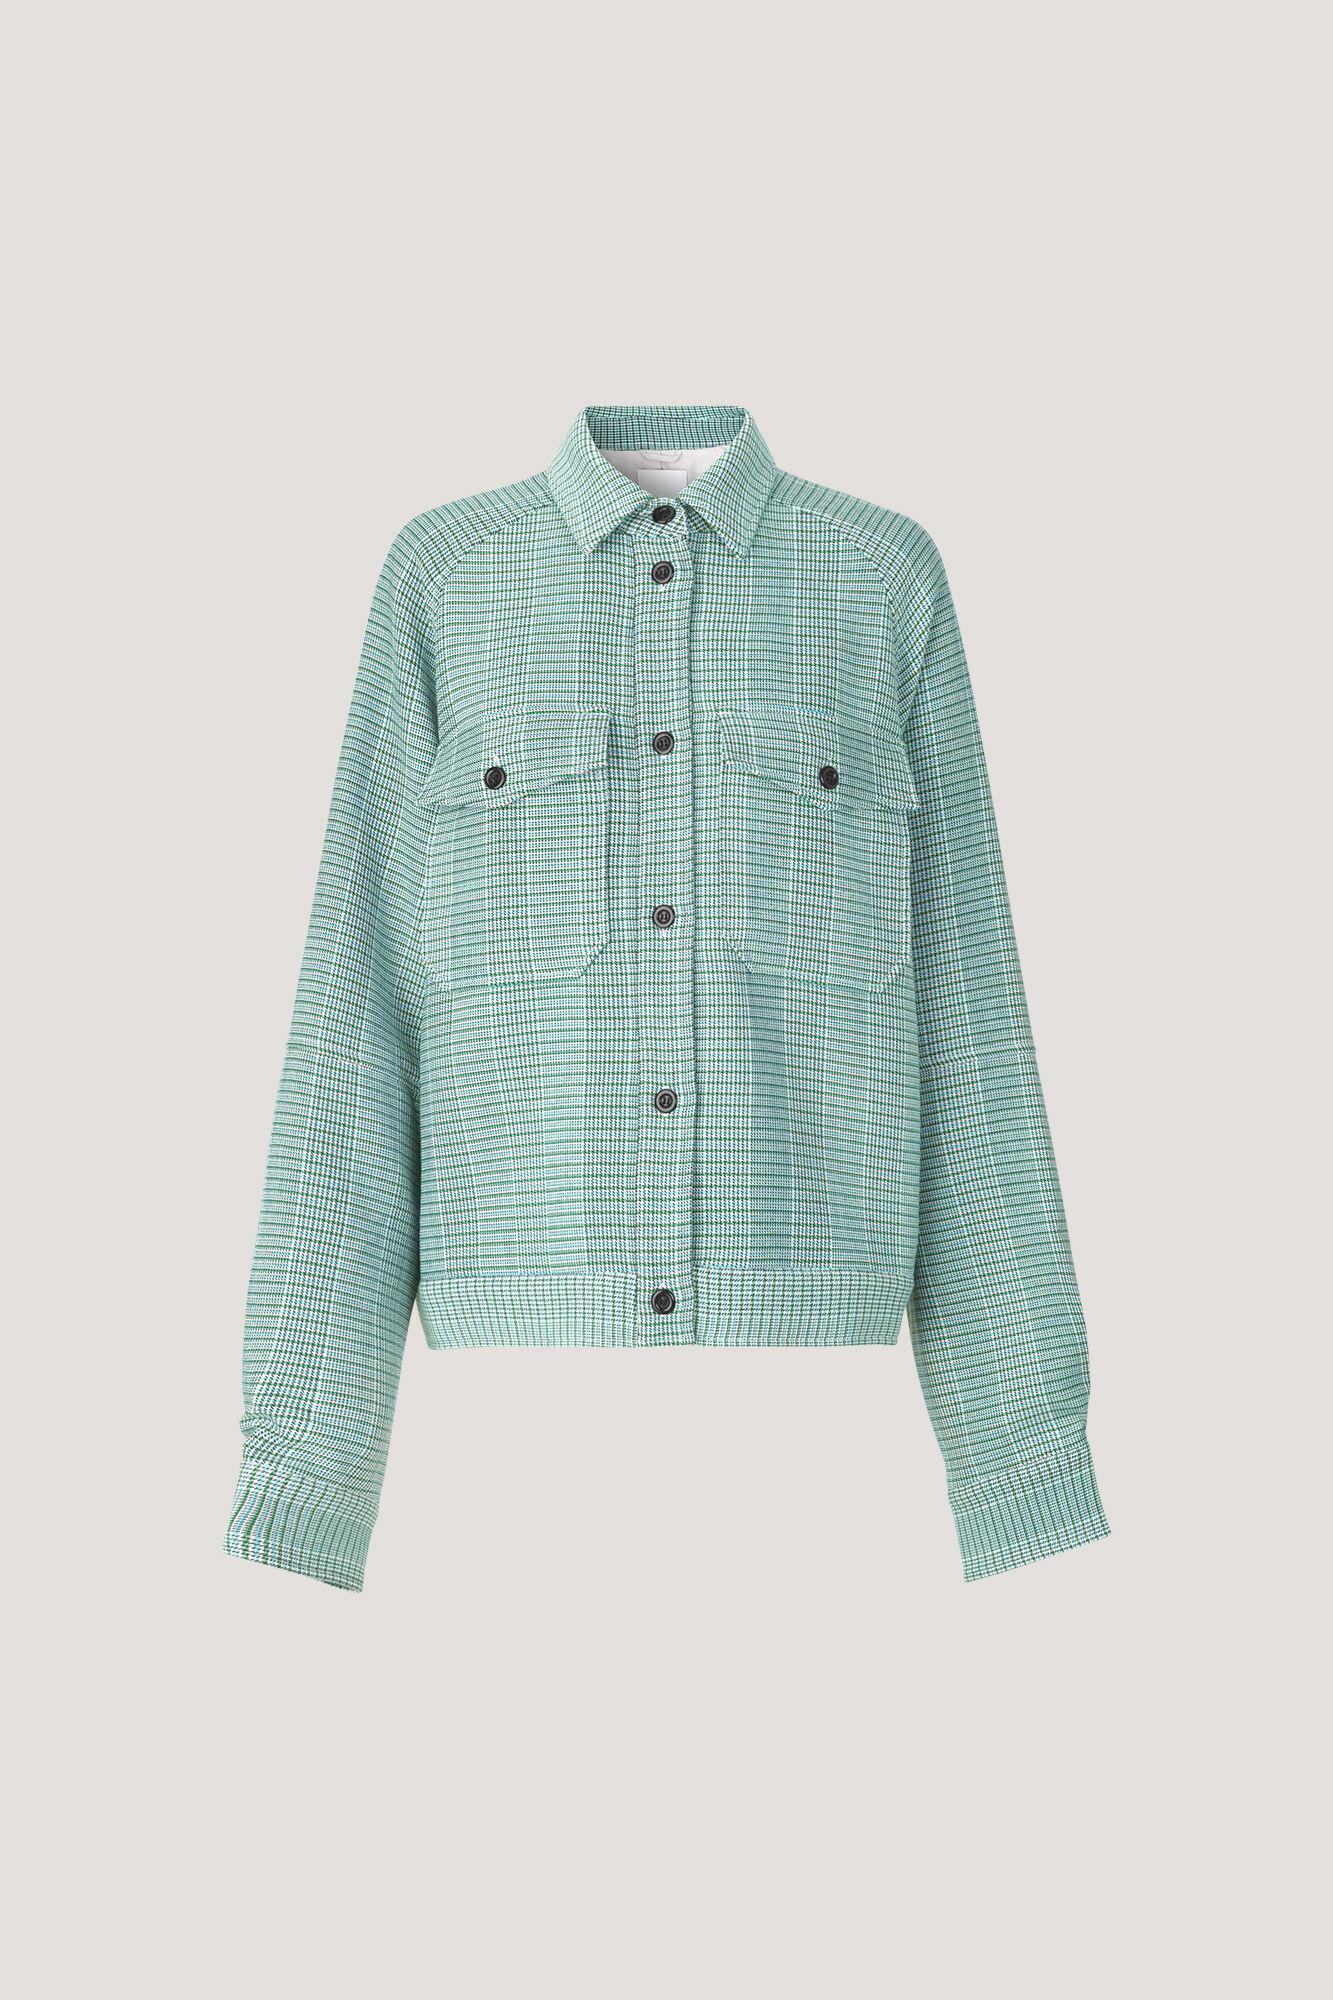 Coats Store Jacket amp; Samsøe Women's Samsøe® And 5wCPqa